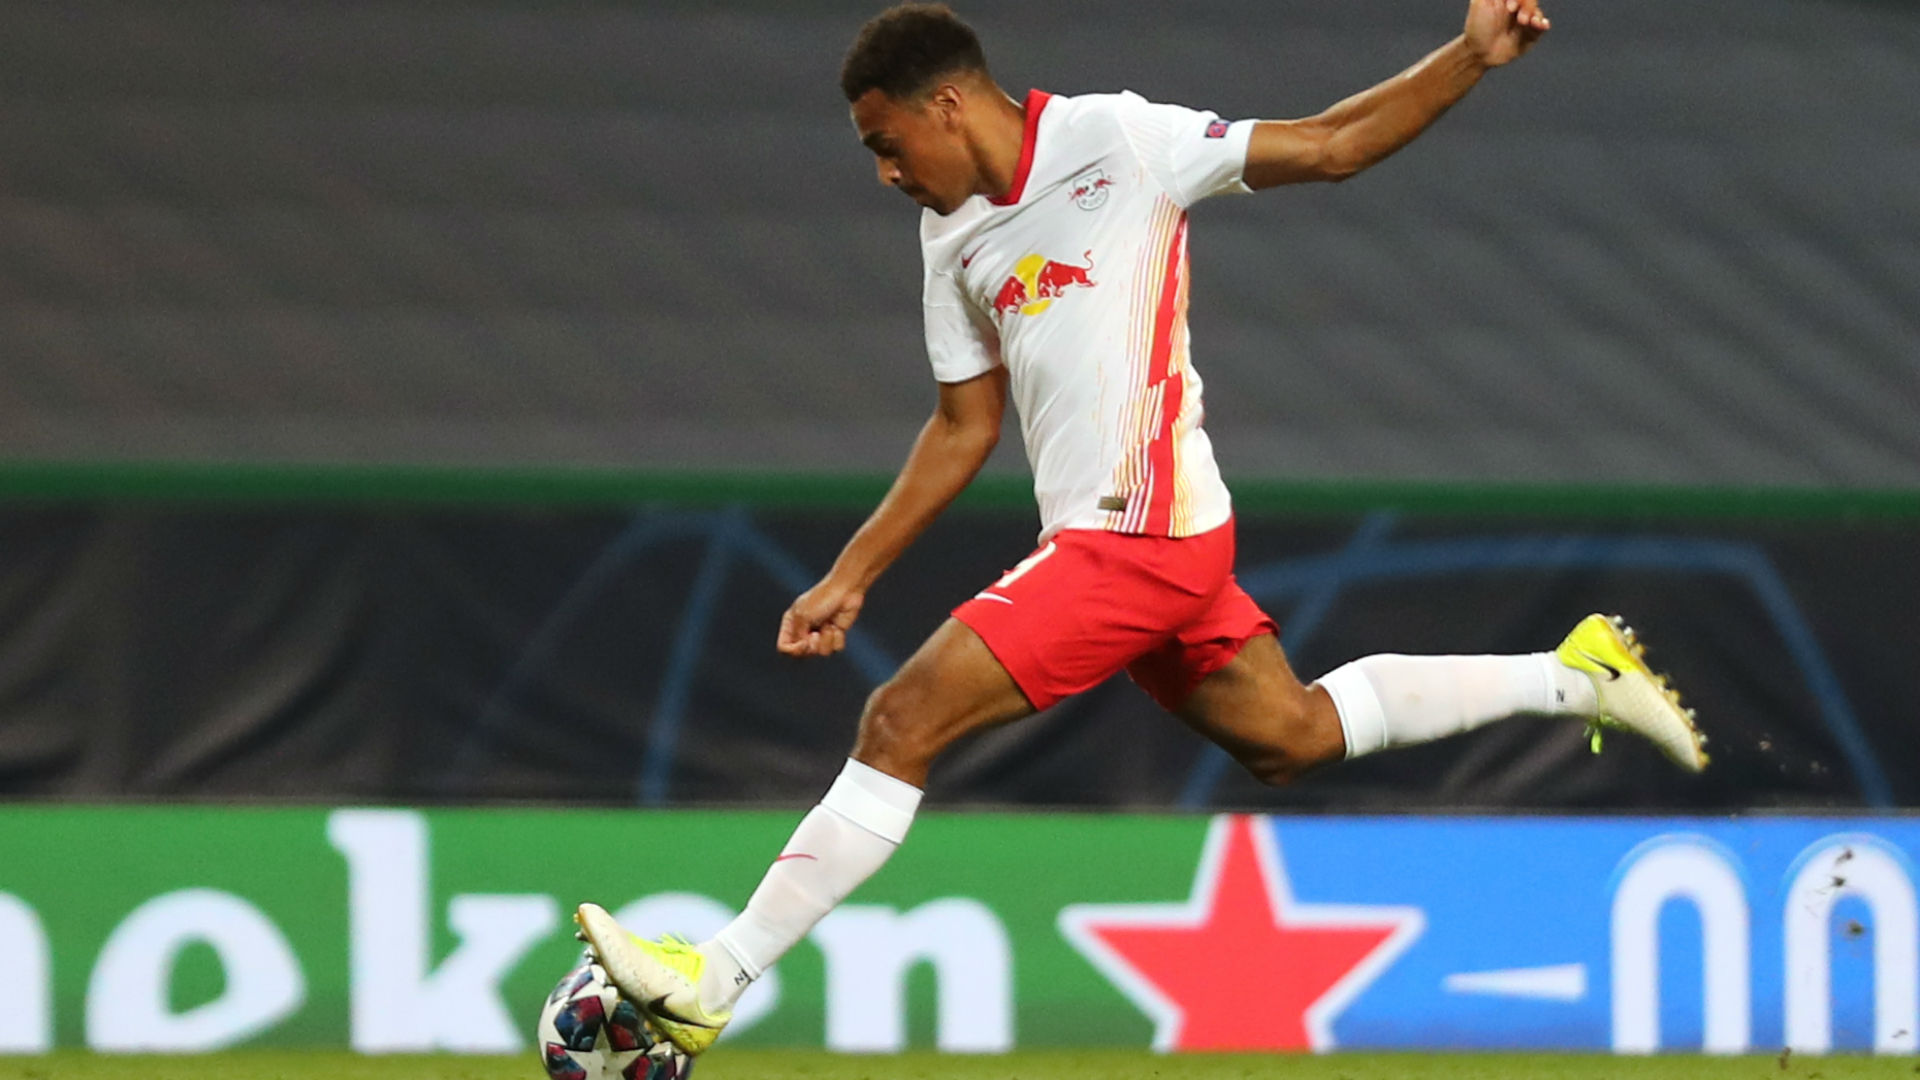 Top 5 North Americans to watch in the 2020-21 Bundesliga season